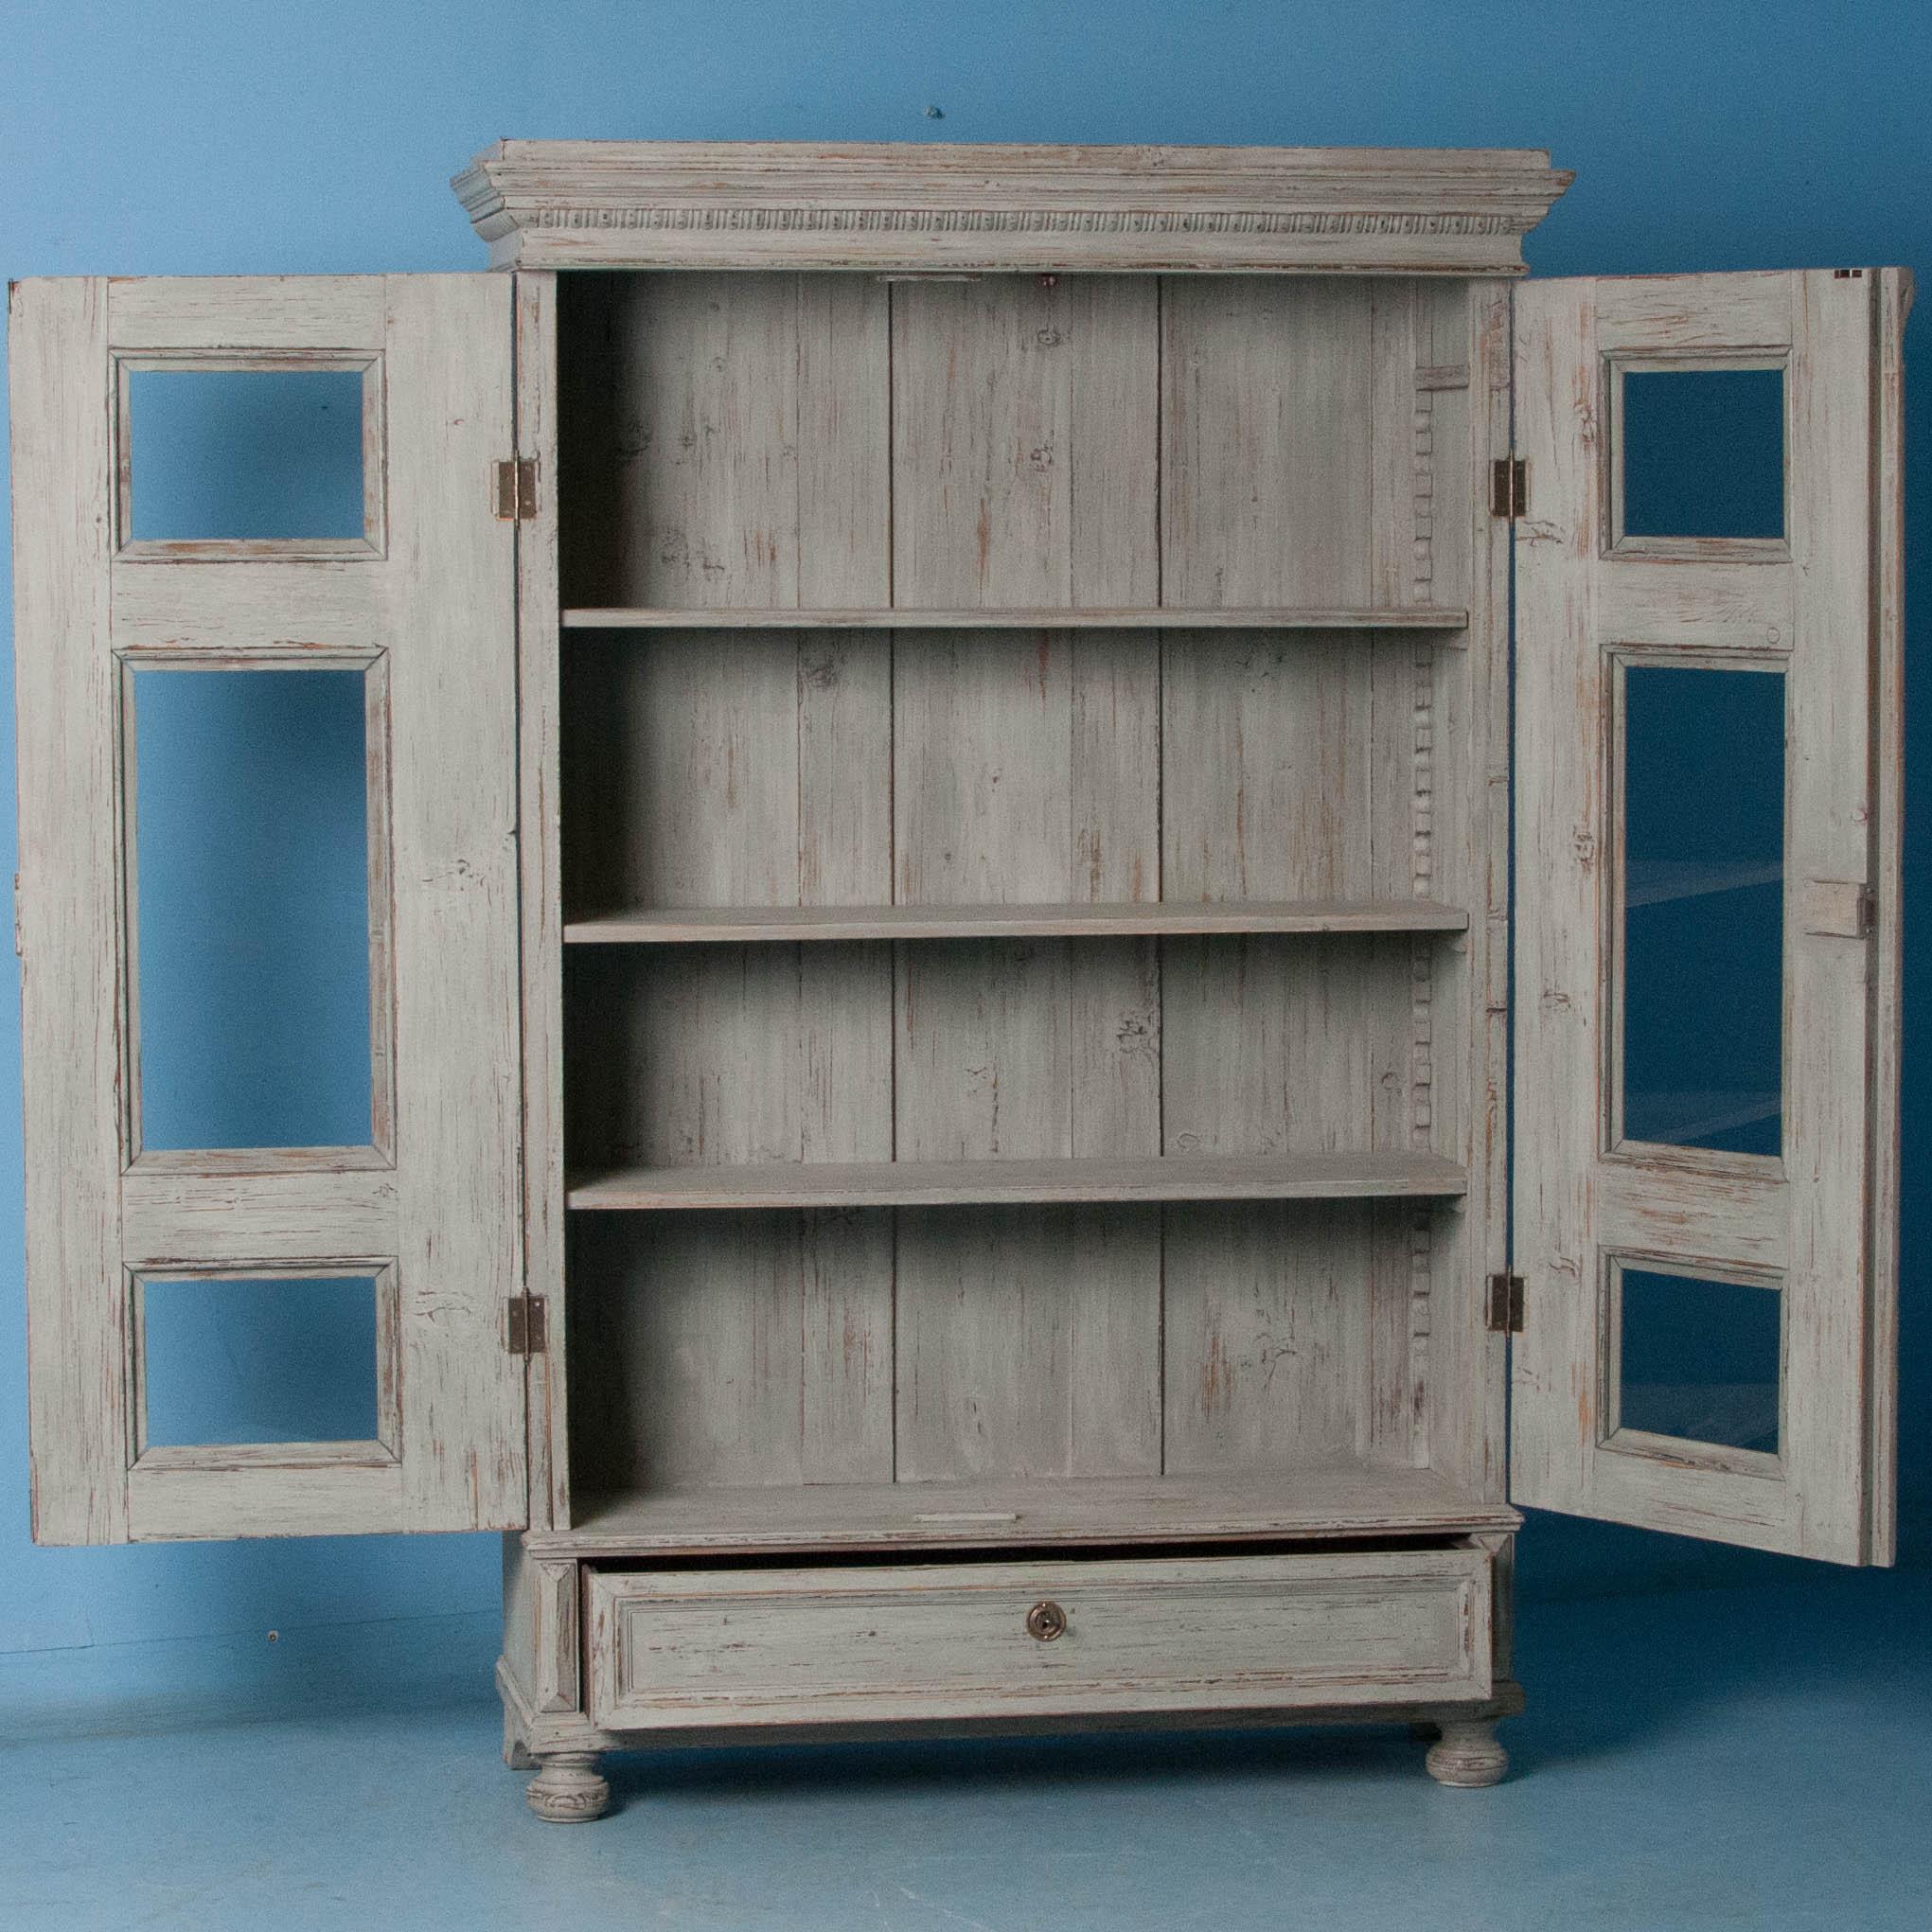 house raw kids ne horizontal bookcases bookcase vintage school